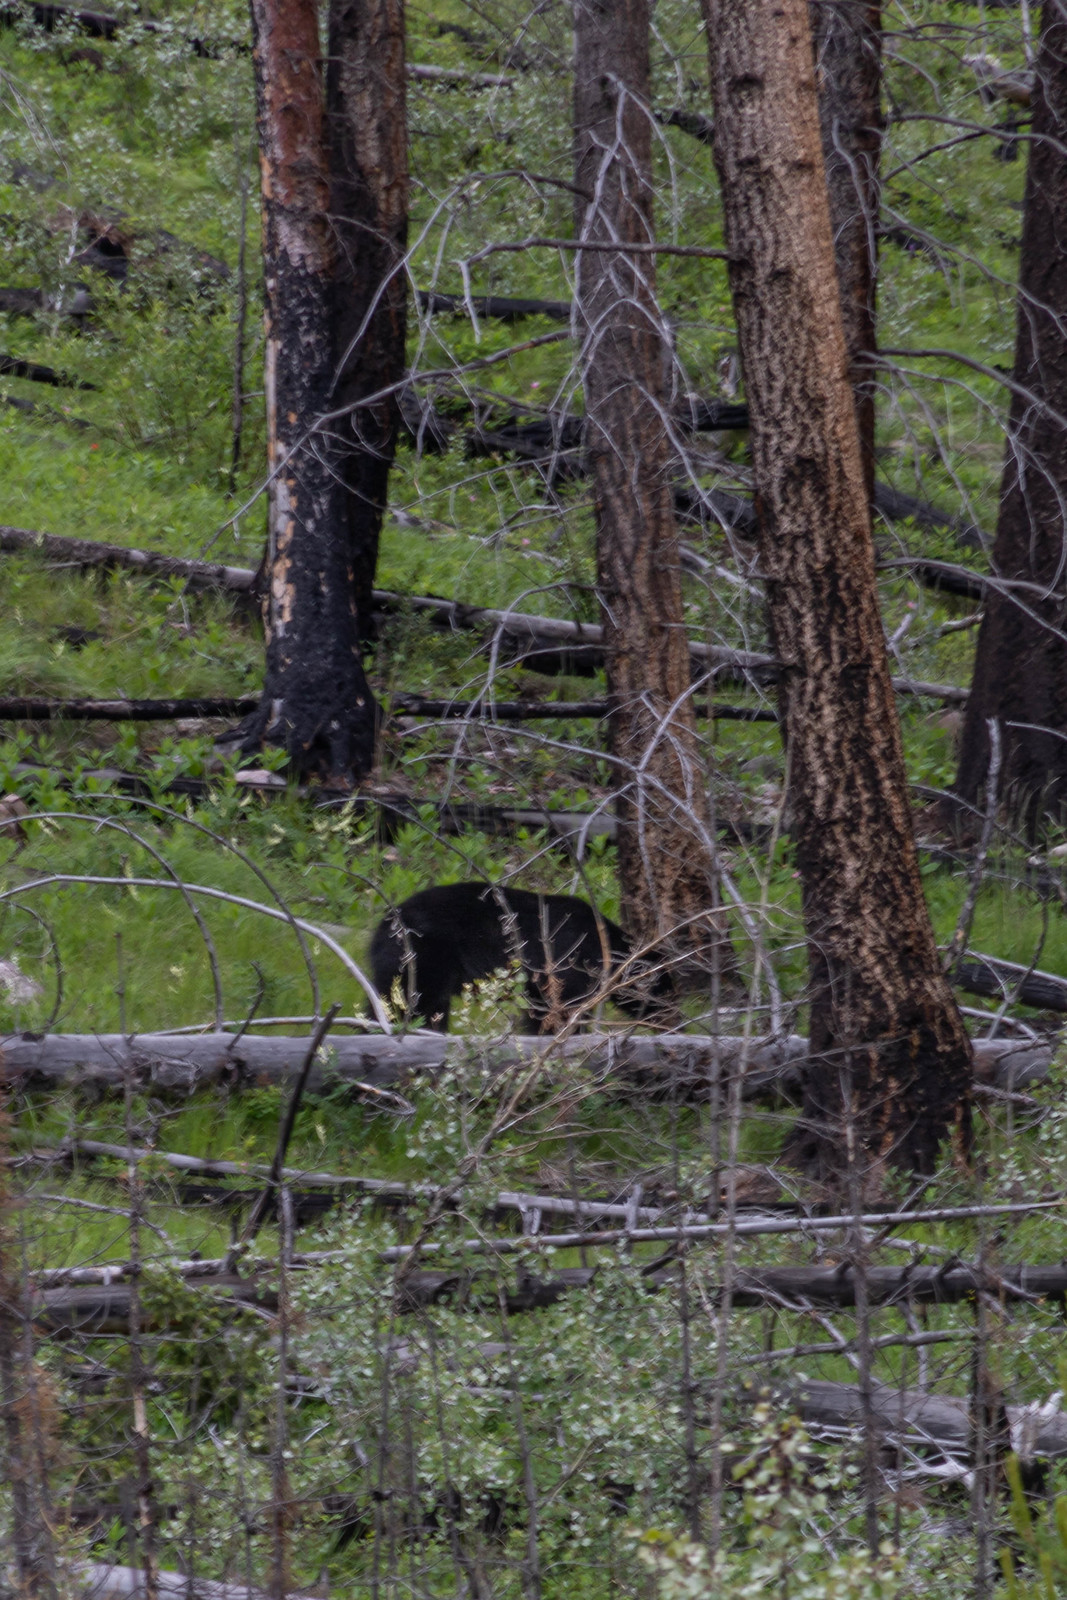 06.29. Banff National Park, AB, Canada